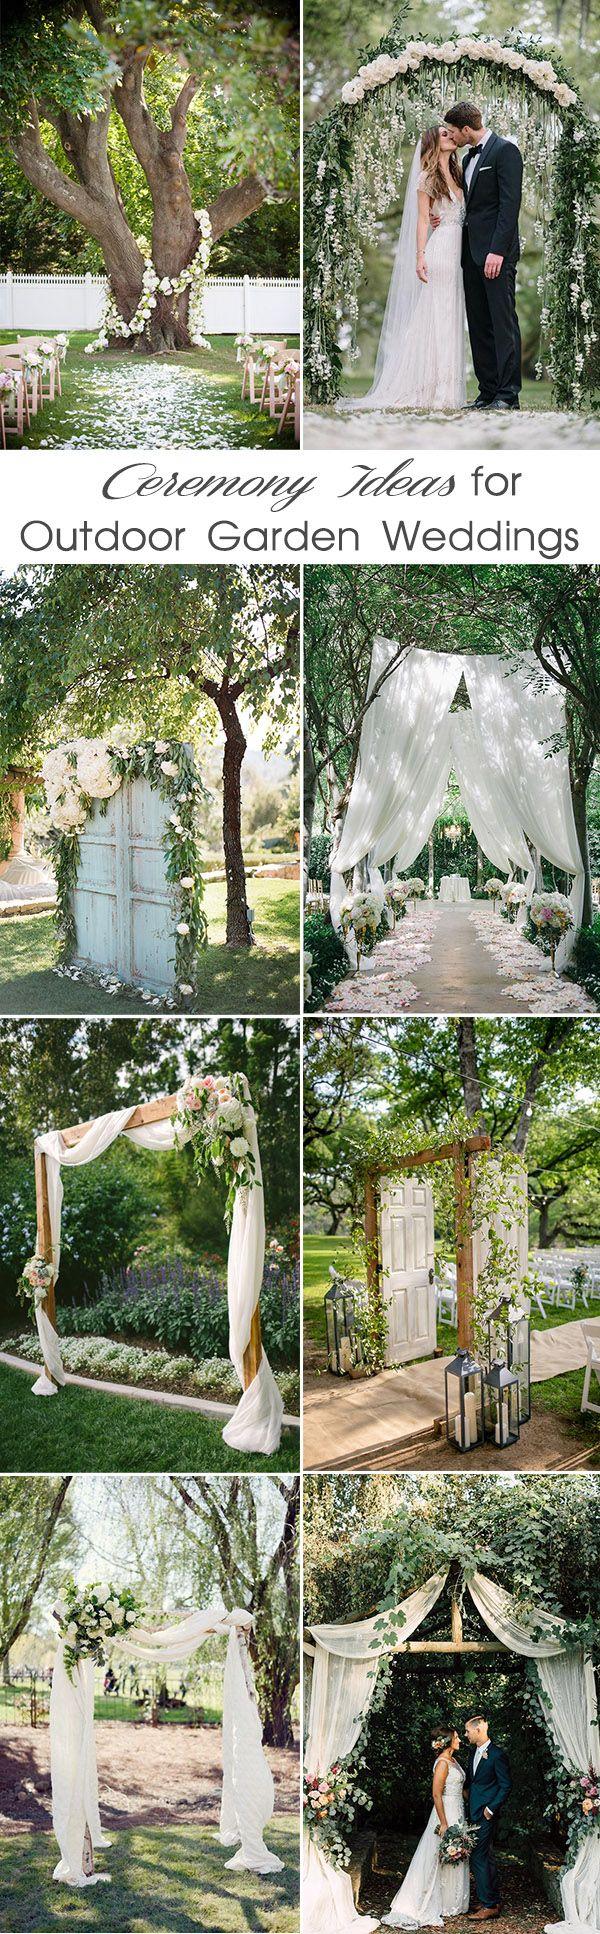 Best 25+ Garden weddings ideas on Pinterest   Garden ...